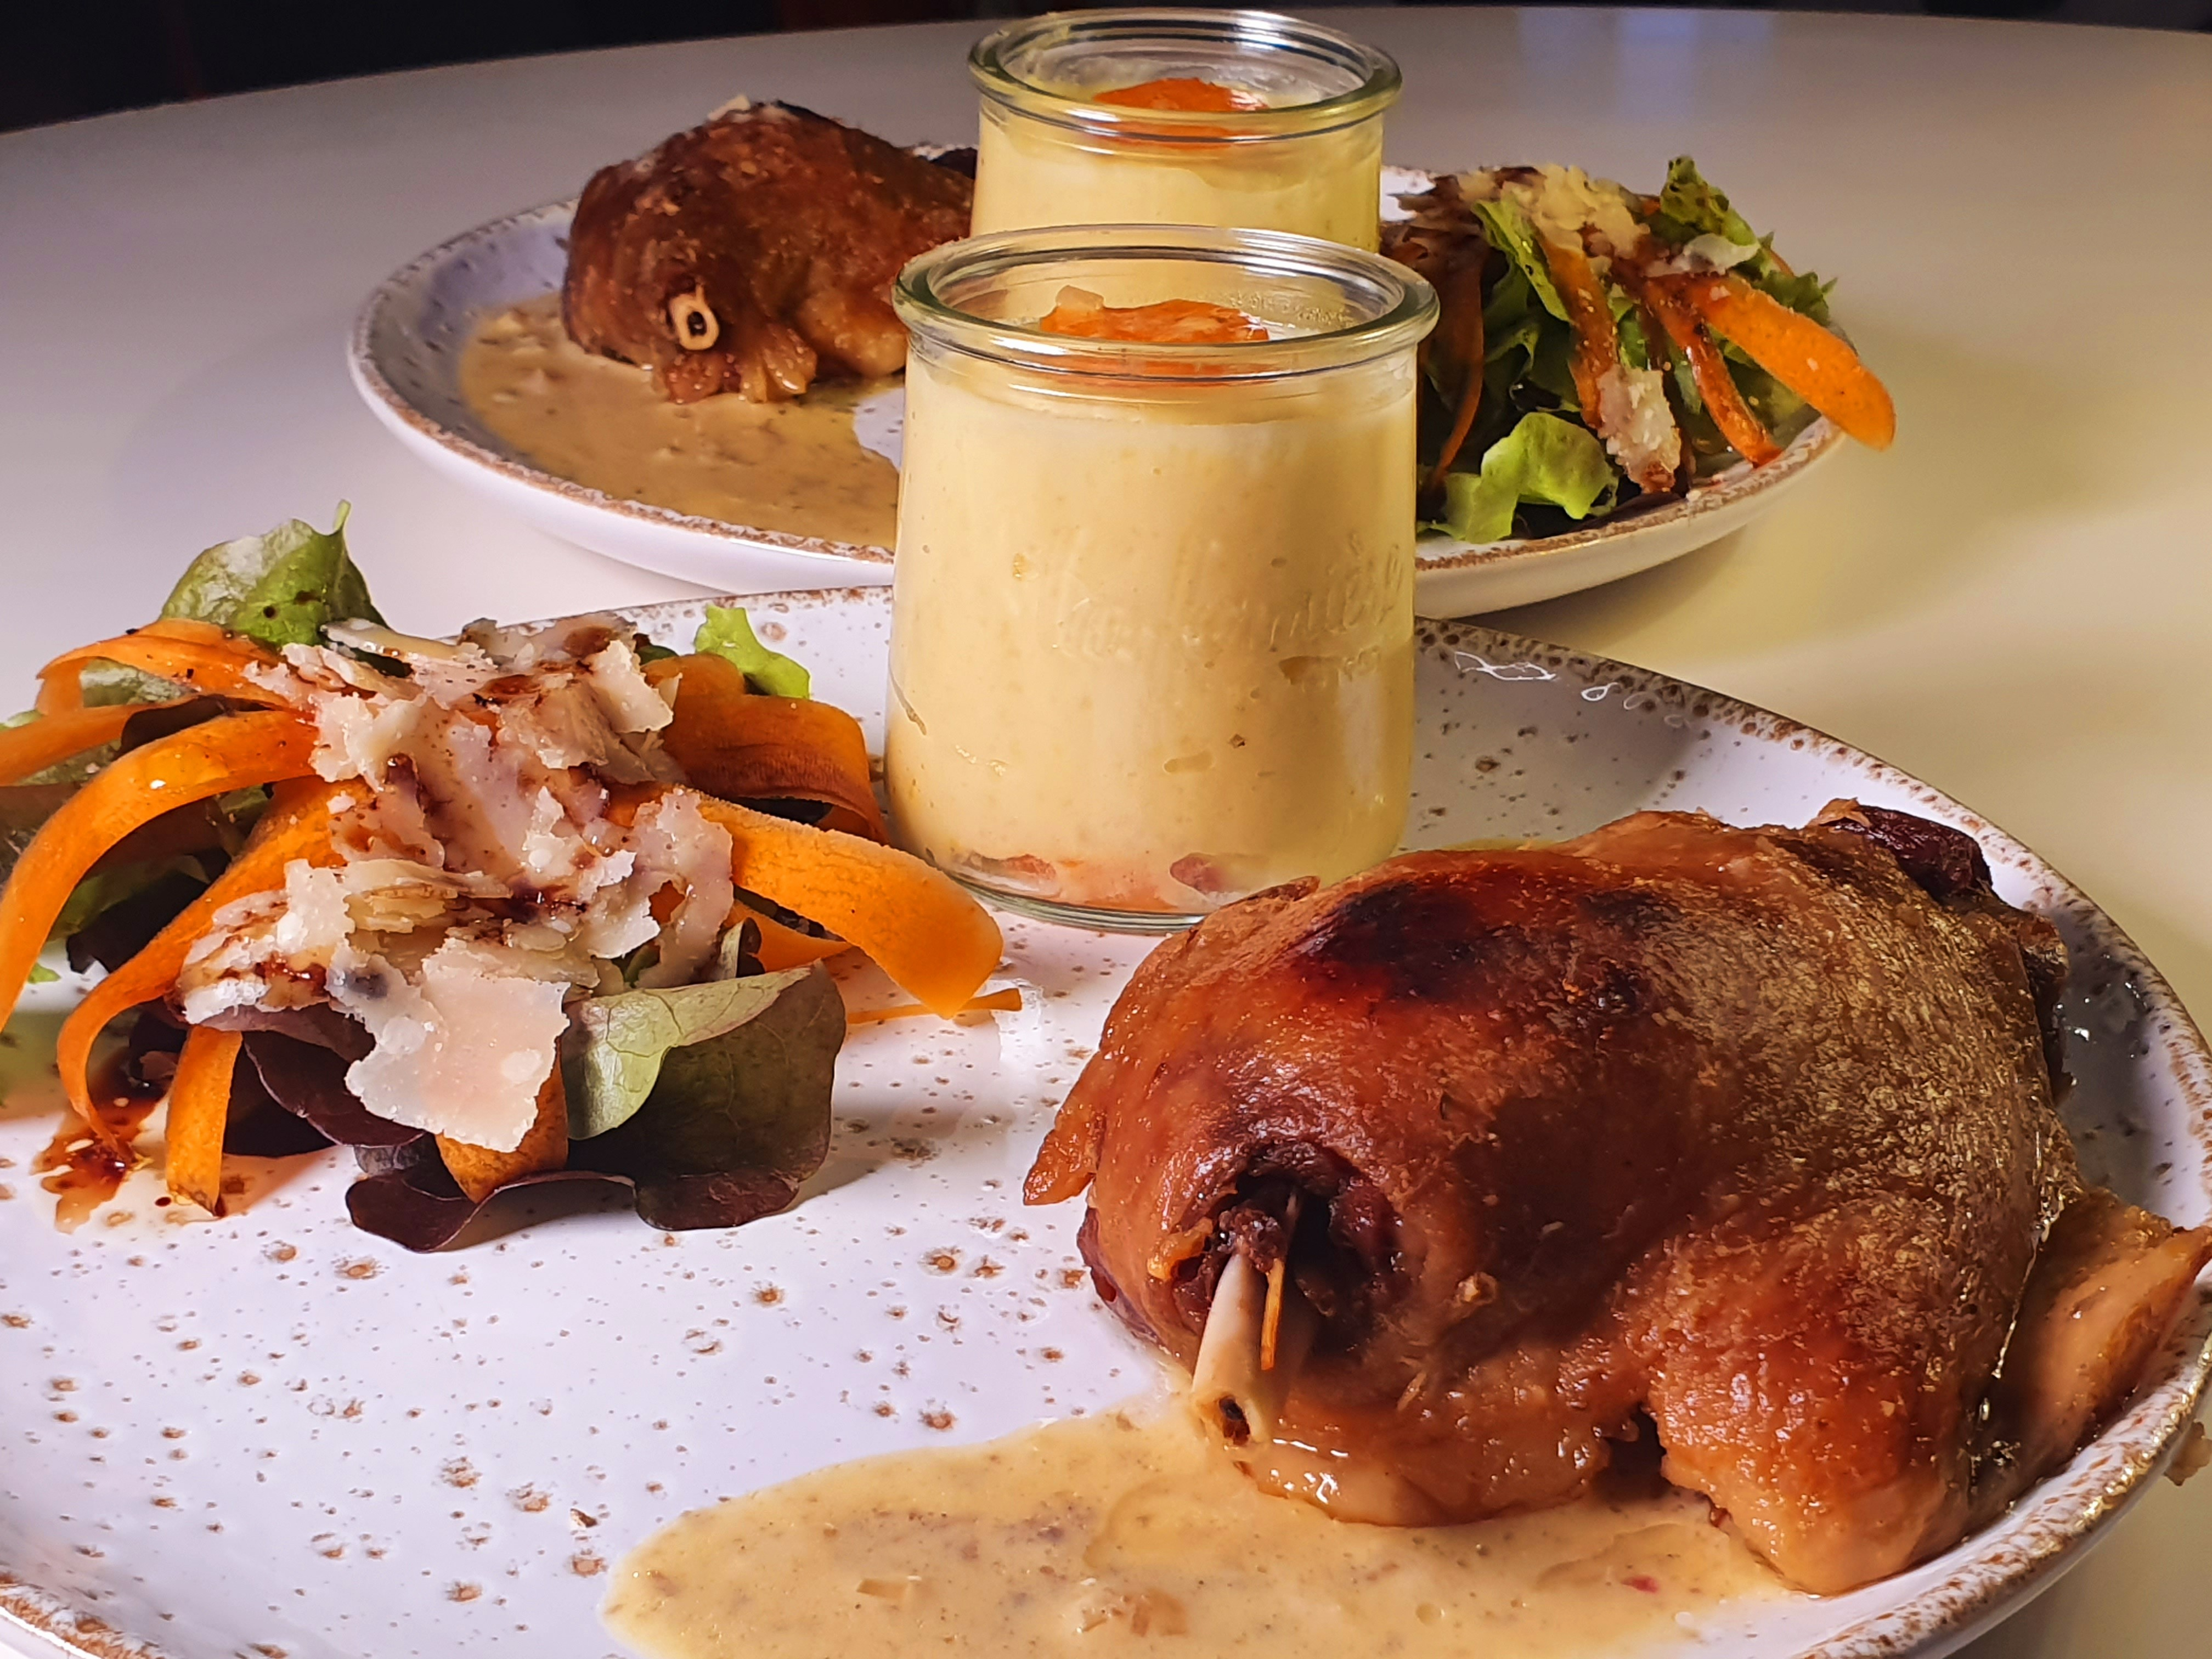 Duck confit, orange truffle sauce and mashed potatoes